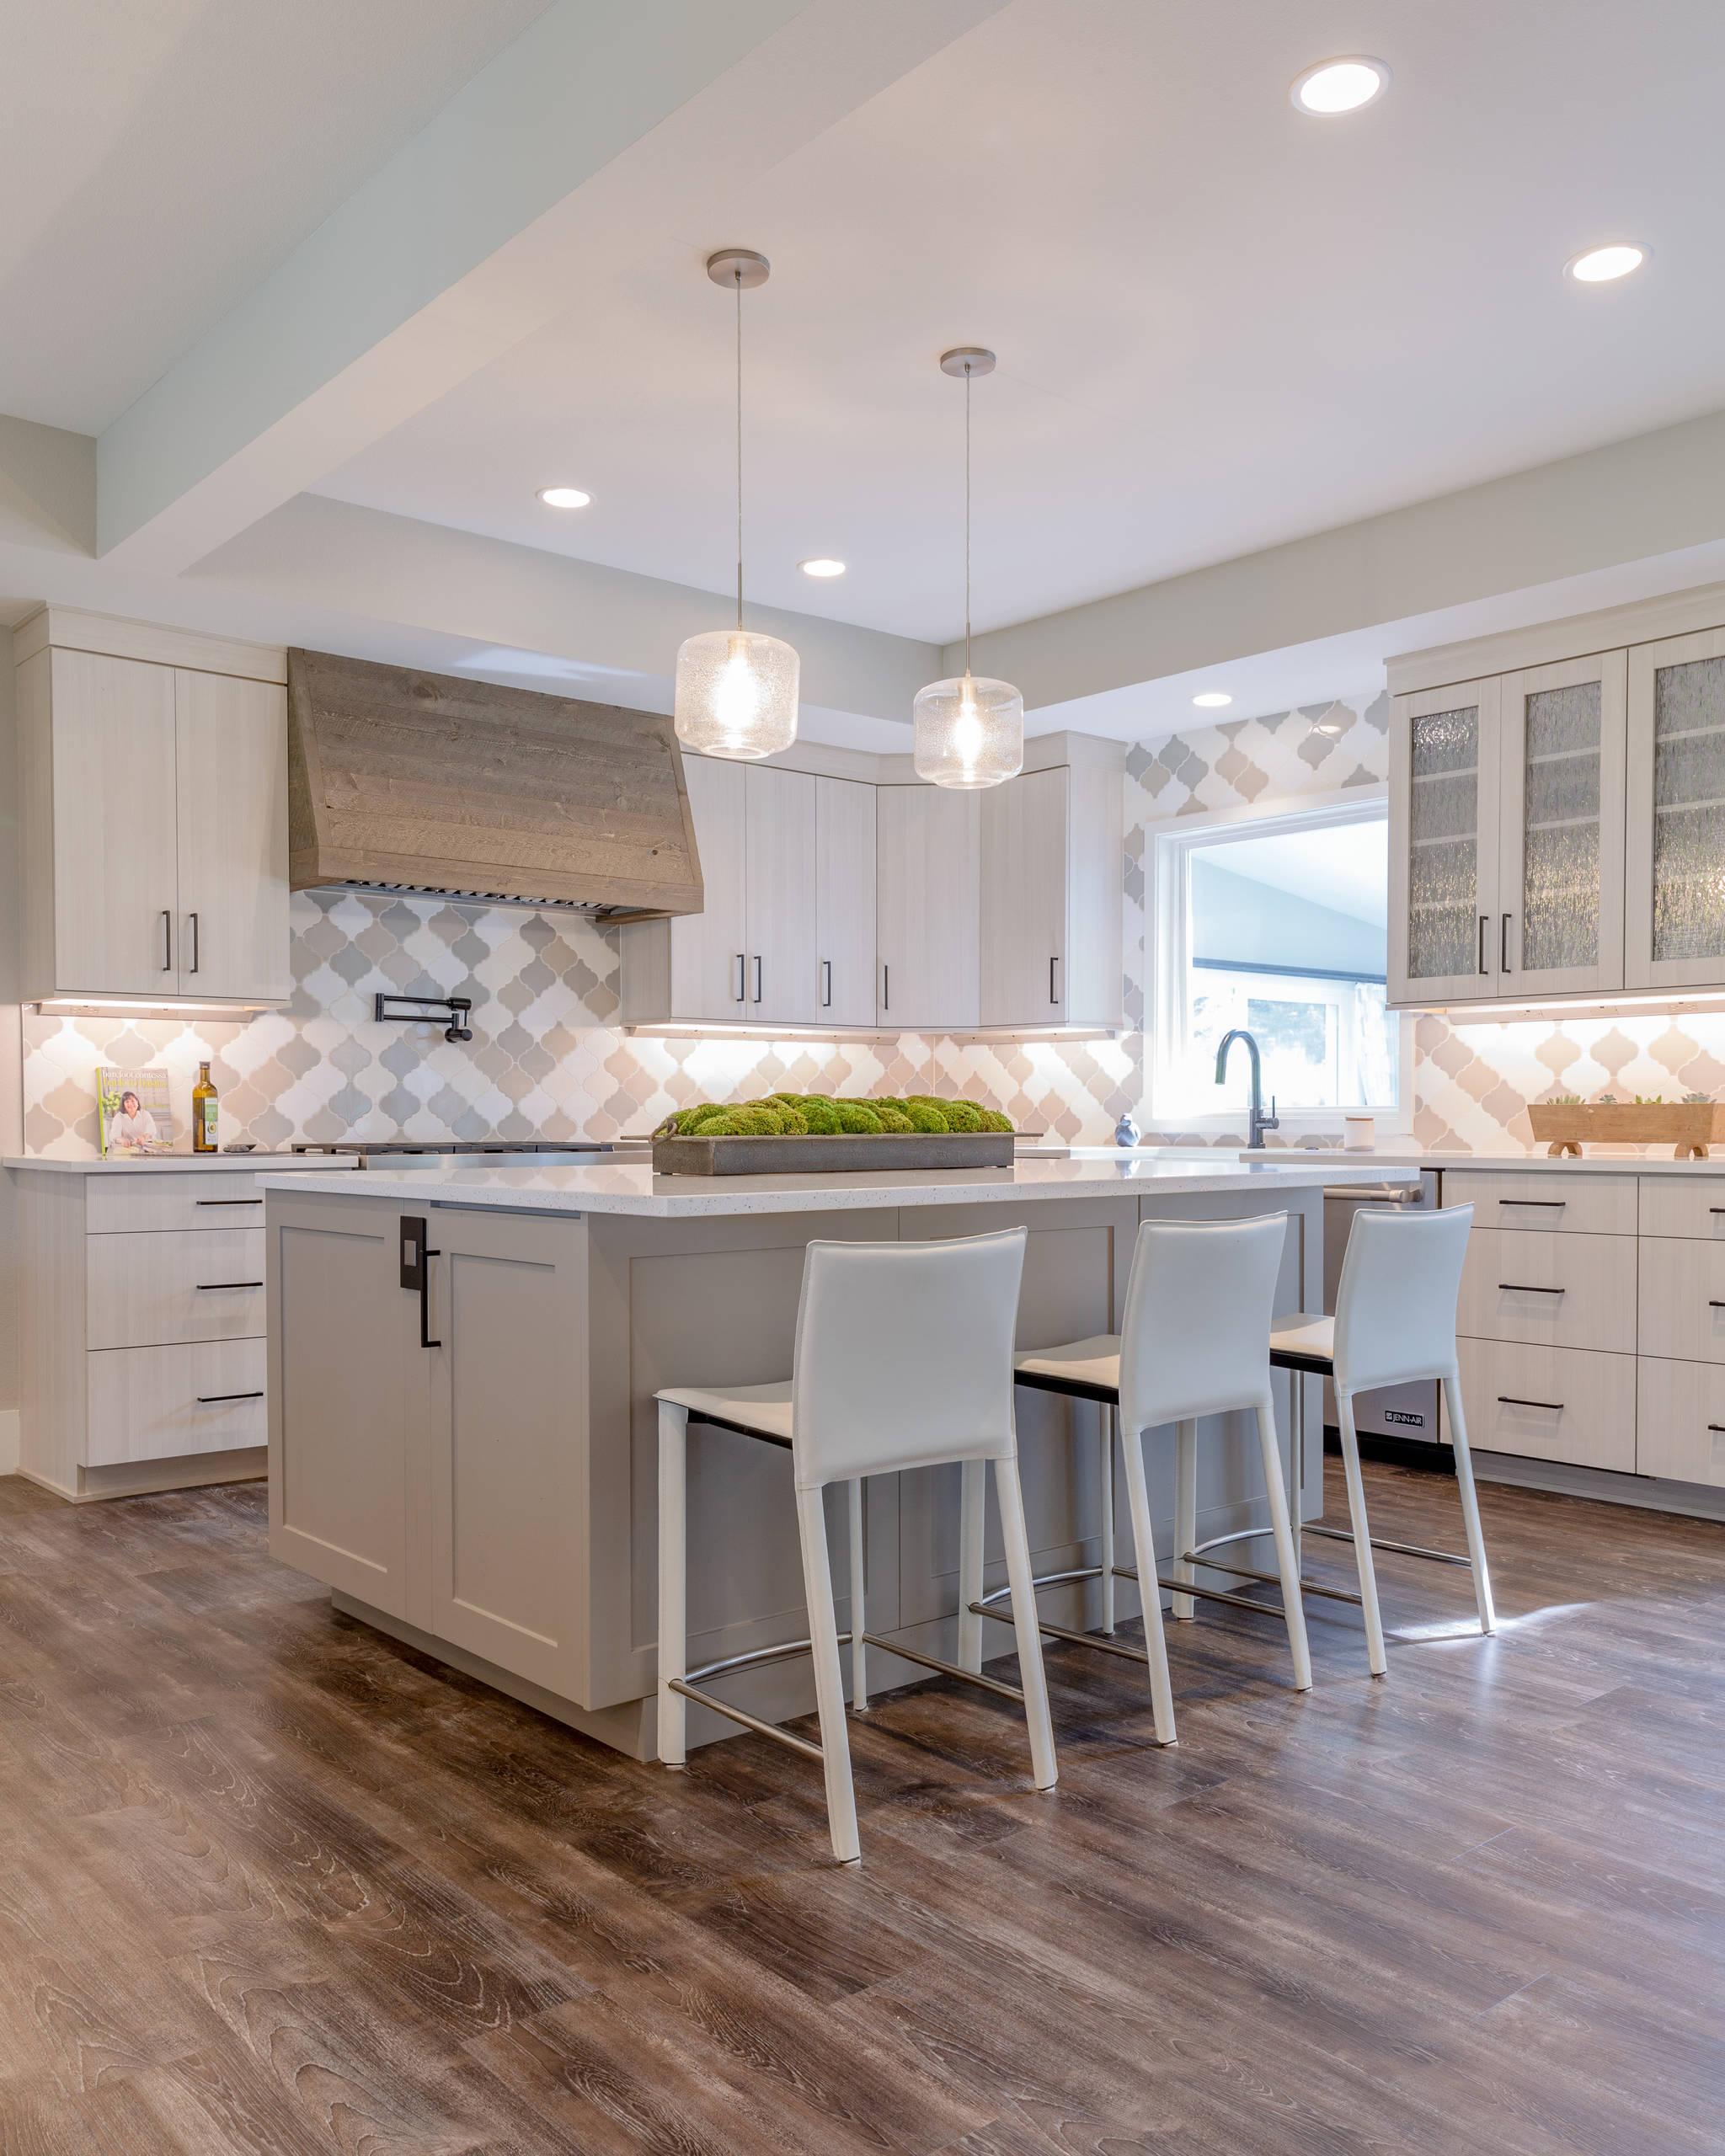 laminate floor kitchen pictures ideas